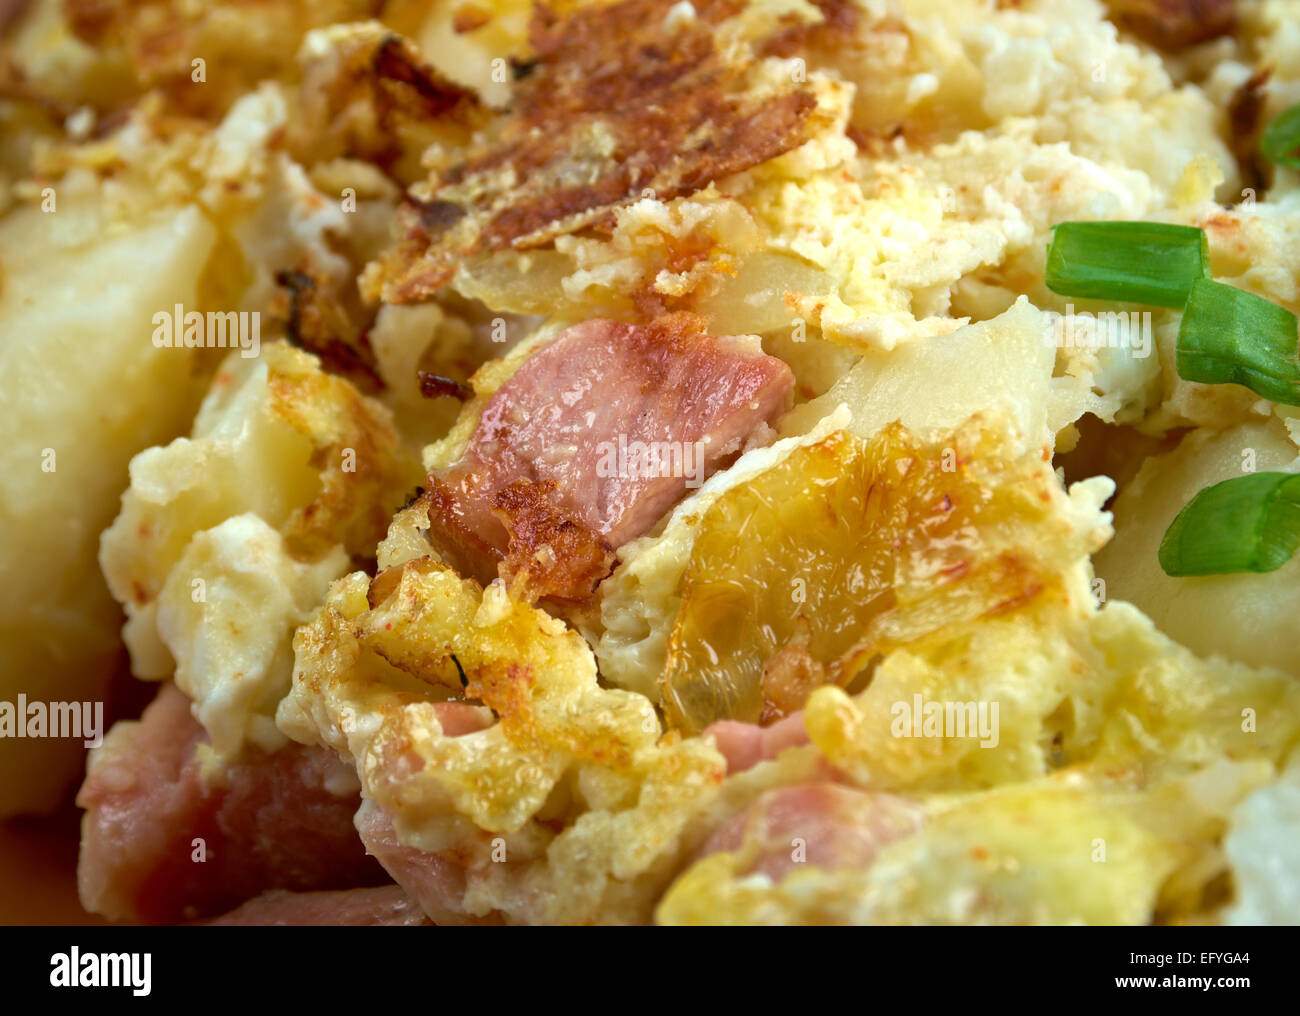 Bauernfruhstuck Farmer's breakfast. German country breakfast dish made from fried potatoes, eggs, onions, leeks - Stock Image